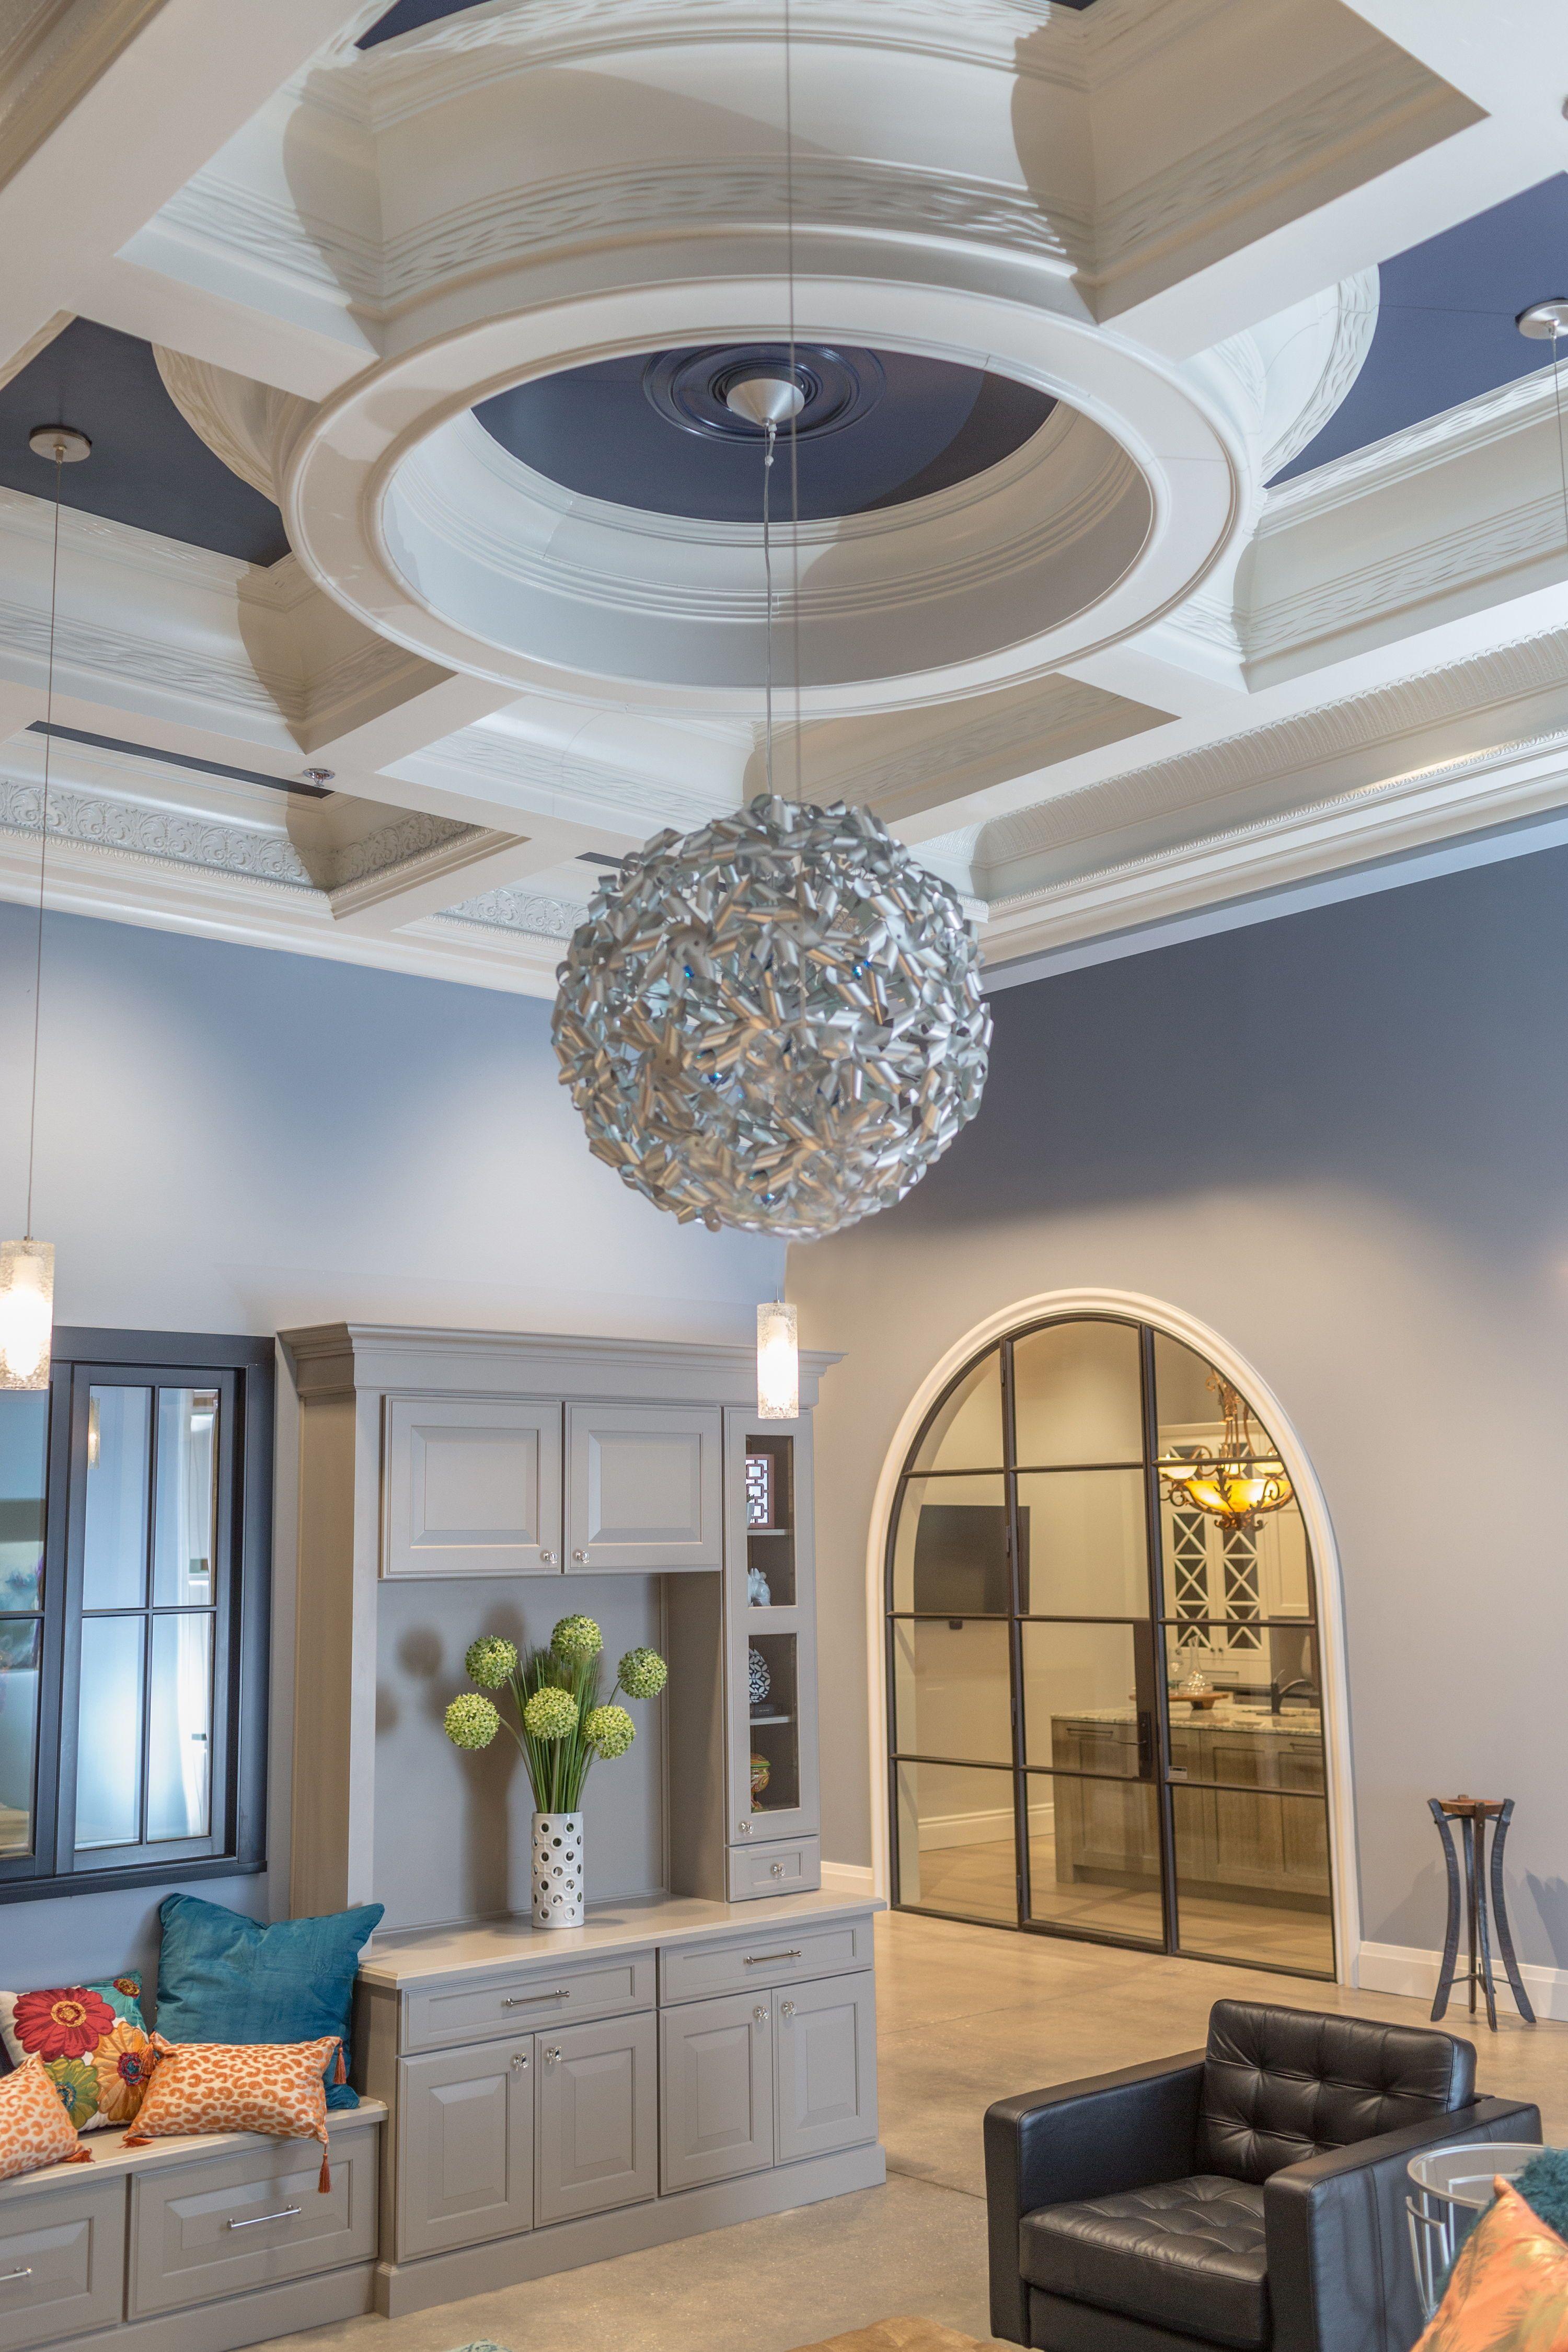 Modern Coffered Ceiling Inspiration Bmc Design Center Home Design Magazines Showroom Design House Design